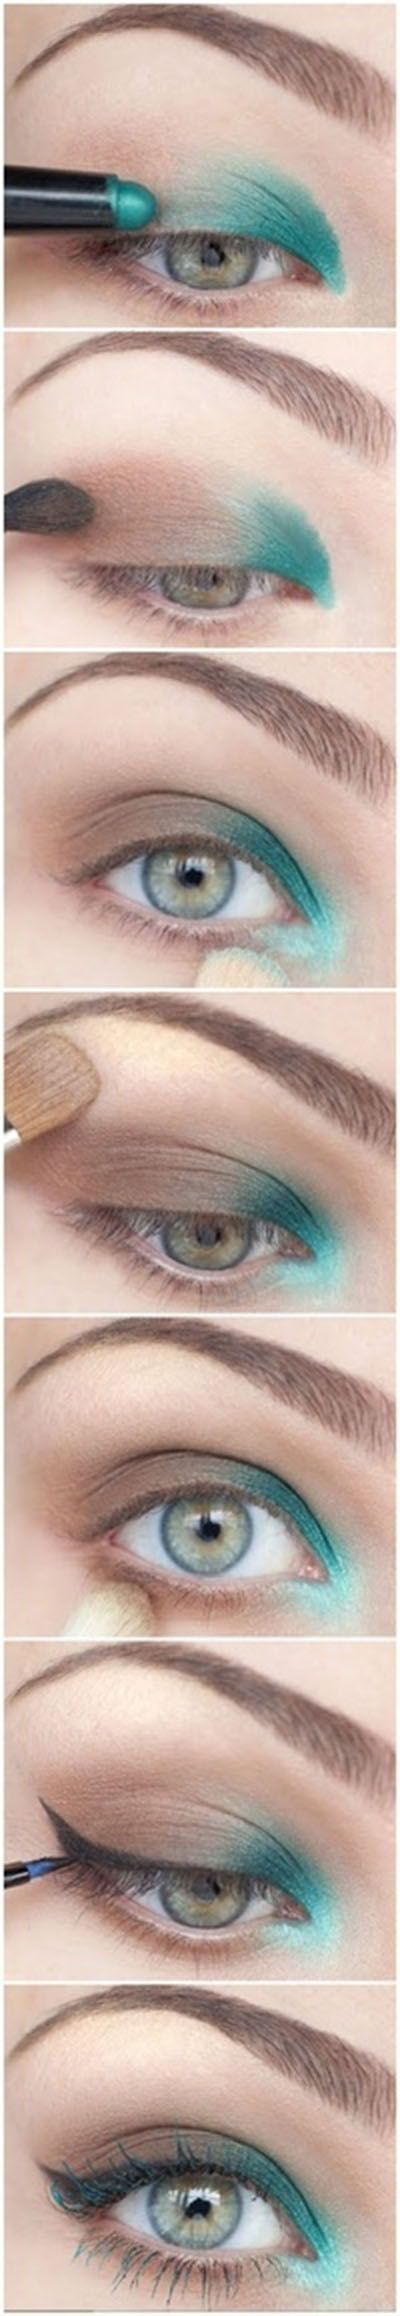 Light Blue Eye Shadow Makeup Tutorial #beauty #makeup #eyeshadow